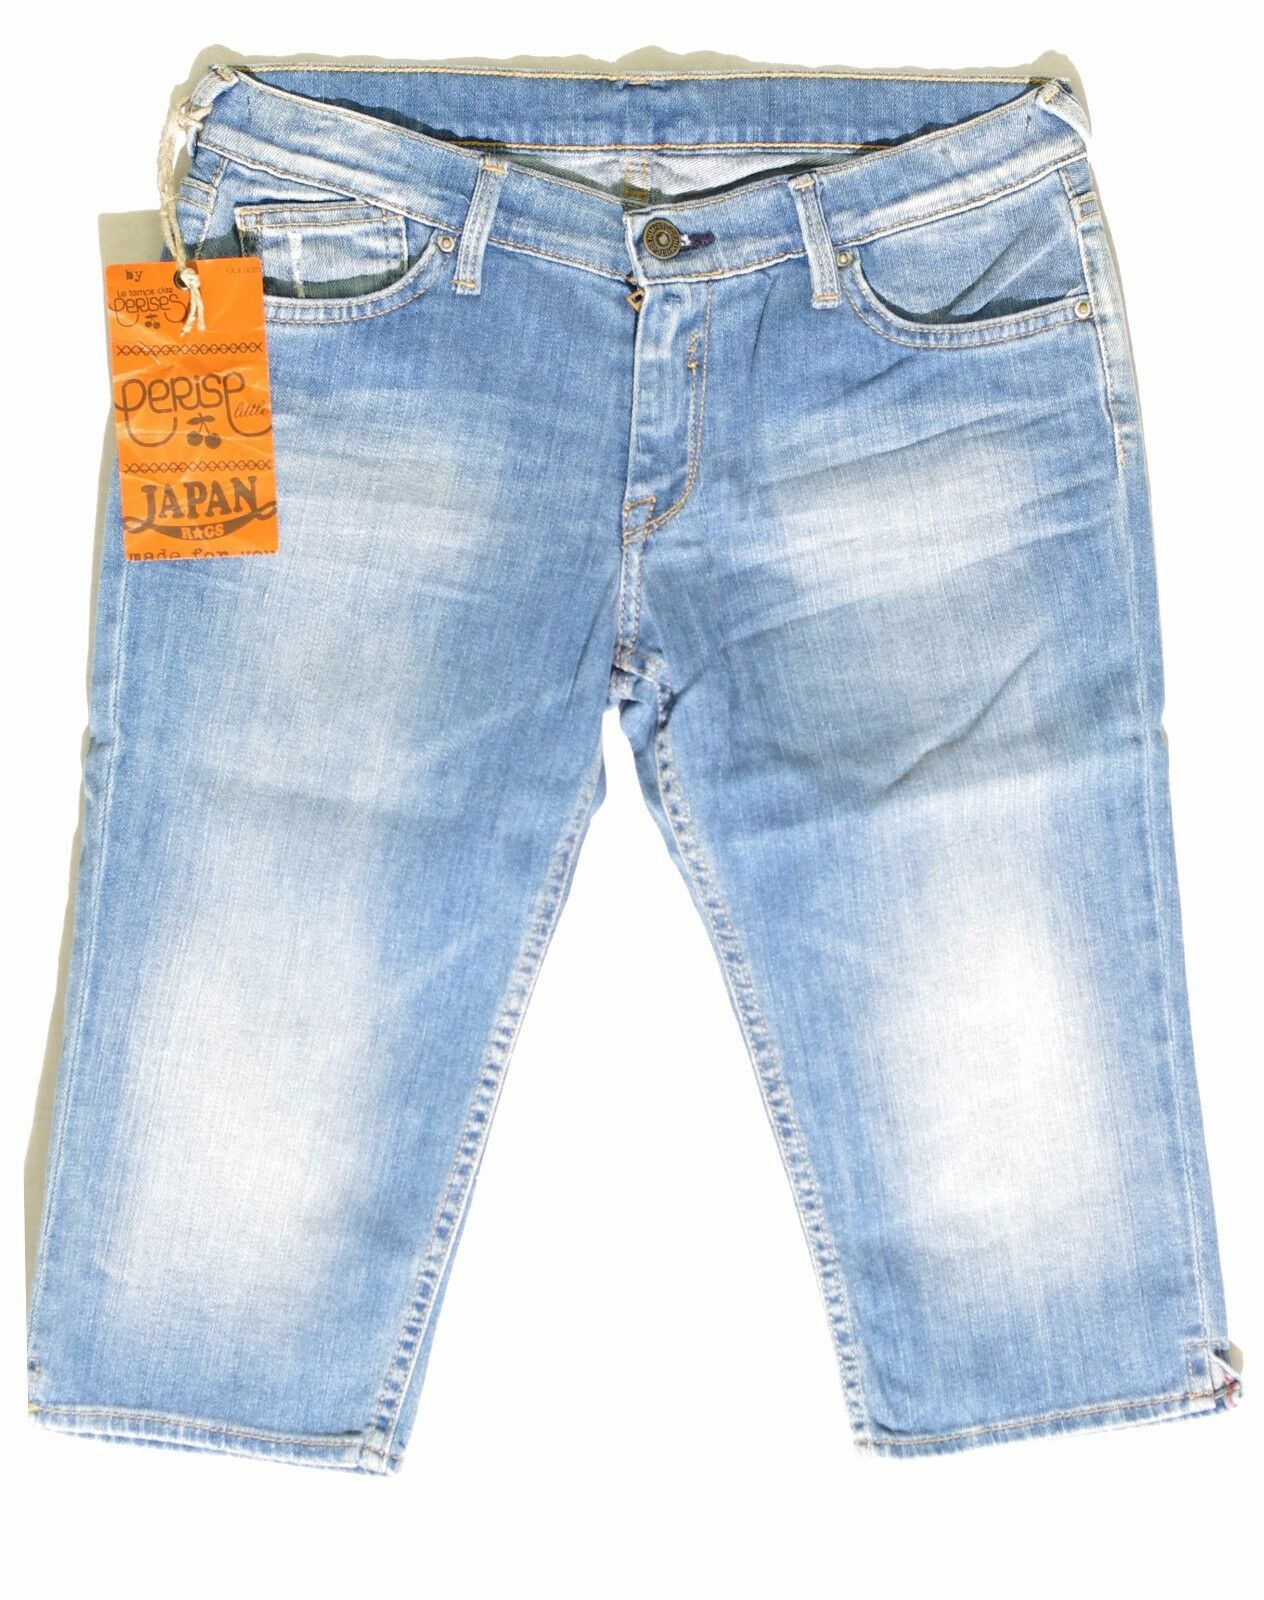 Pantalon Chino rose poudré SCOTCH /& SODA R/'BELLE Junior Fille Taille 12 ans